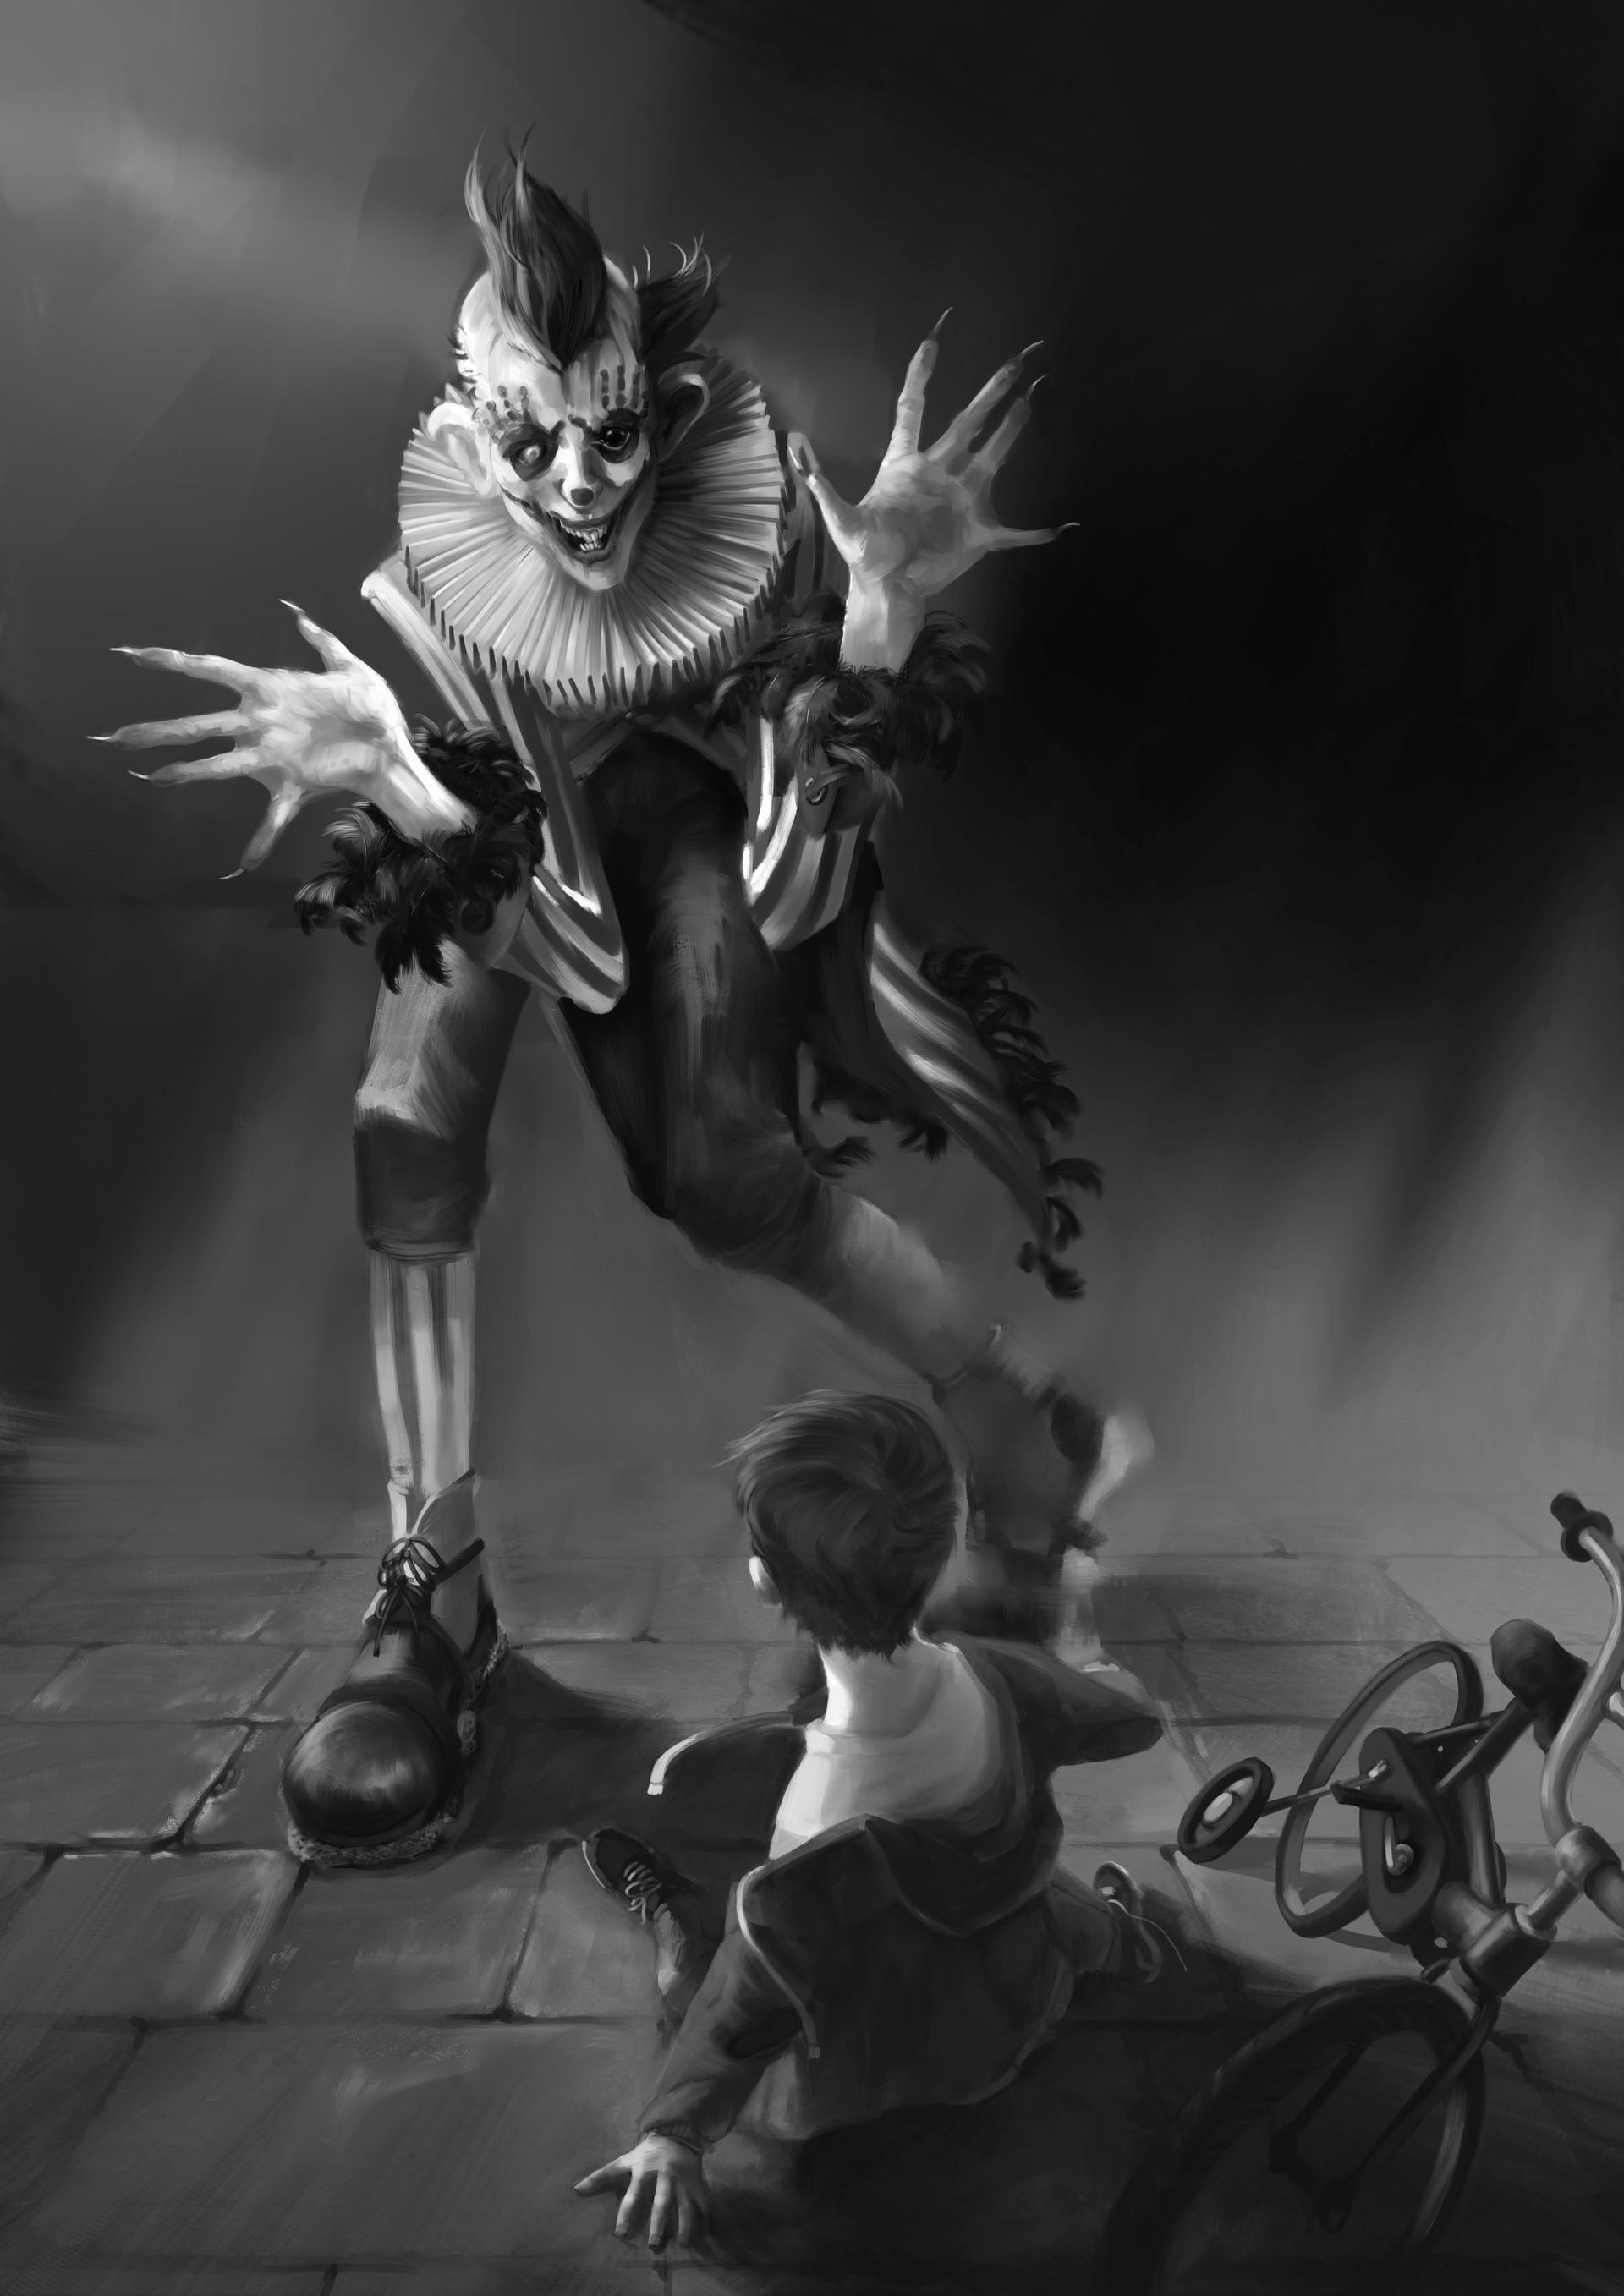 Marina ortega peekaboo clown illustration mo 04